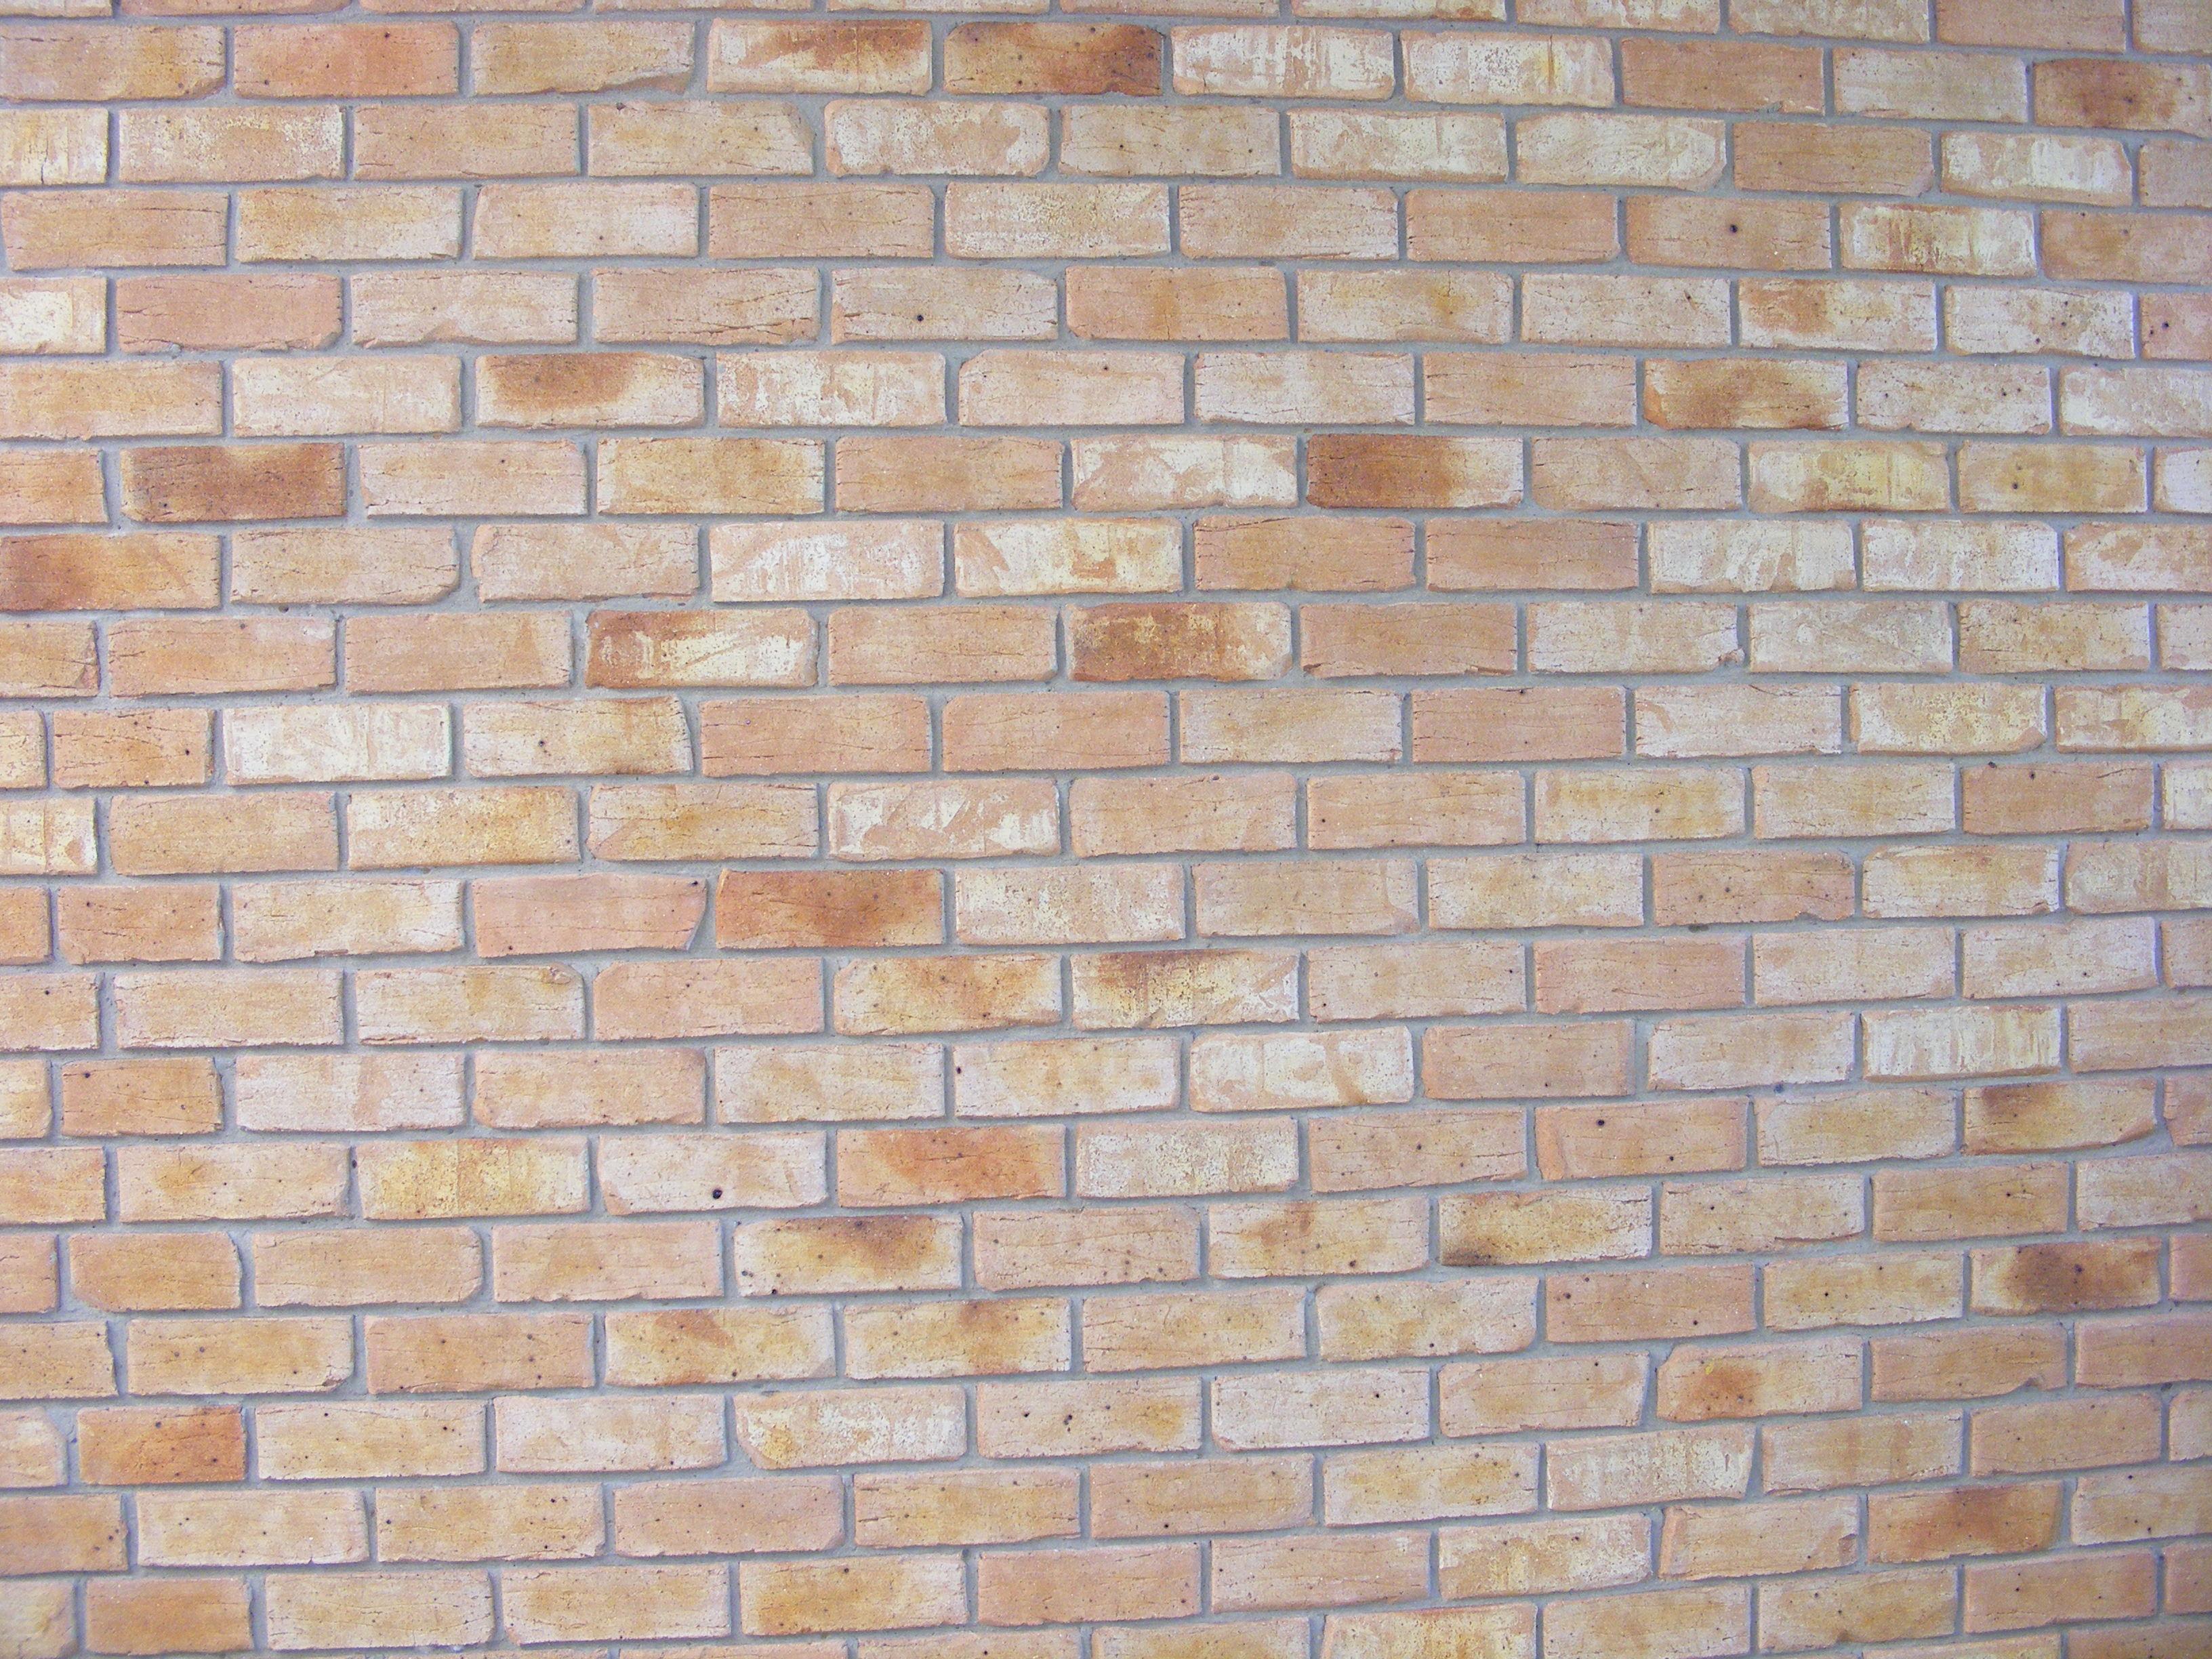 Brick-patterns-wallpaper-wpc9203212